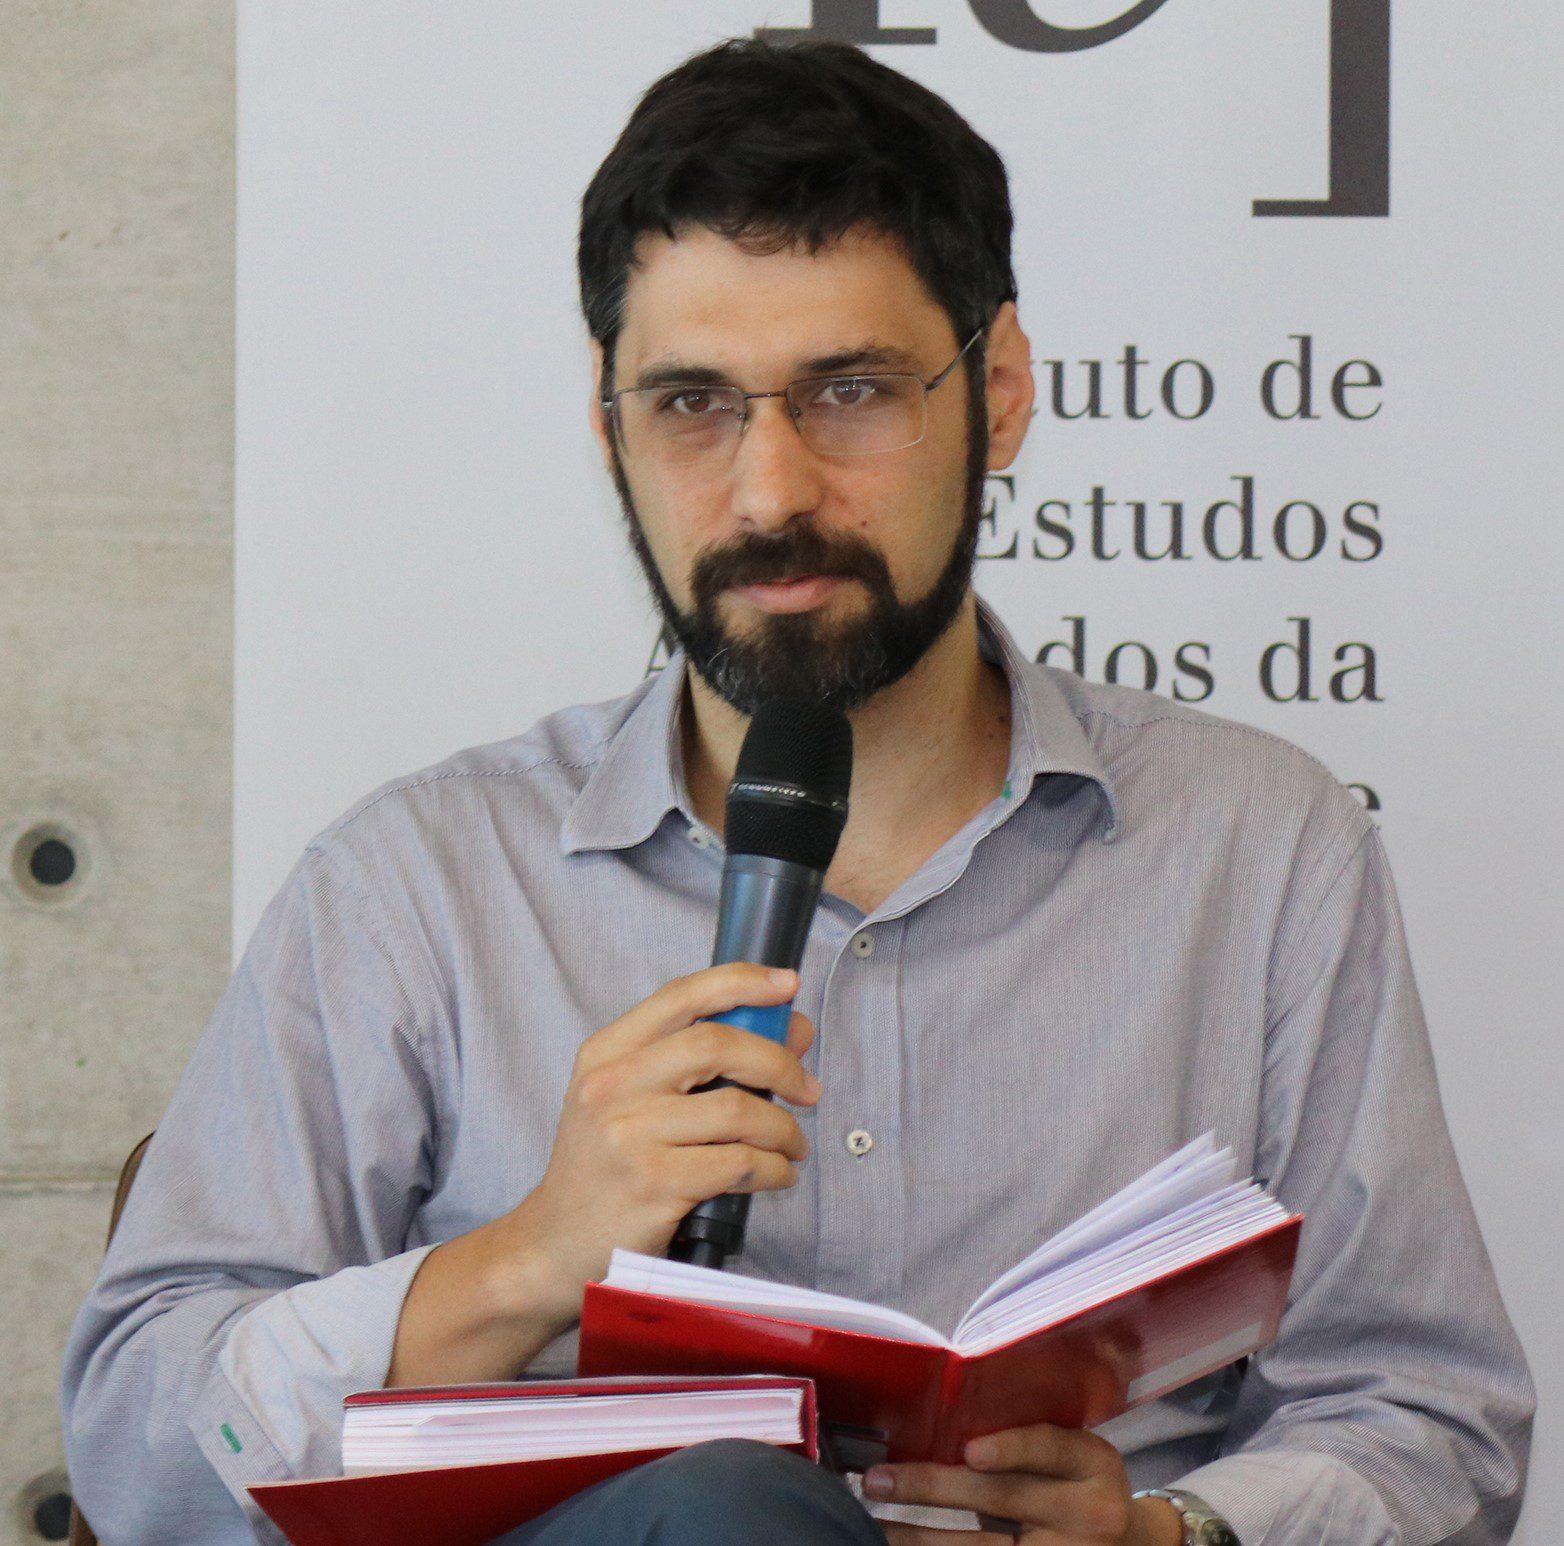 Alexandre Saes